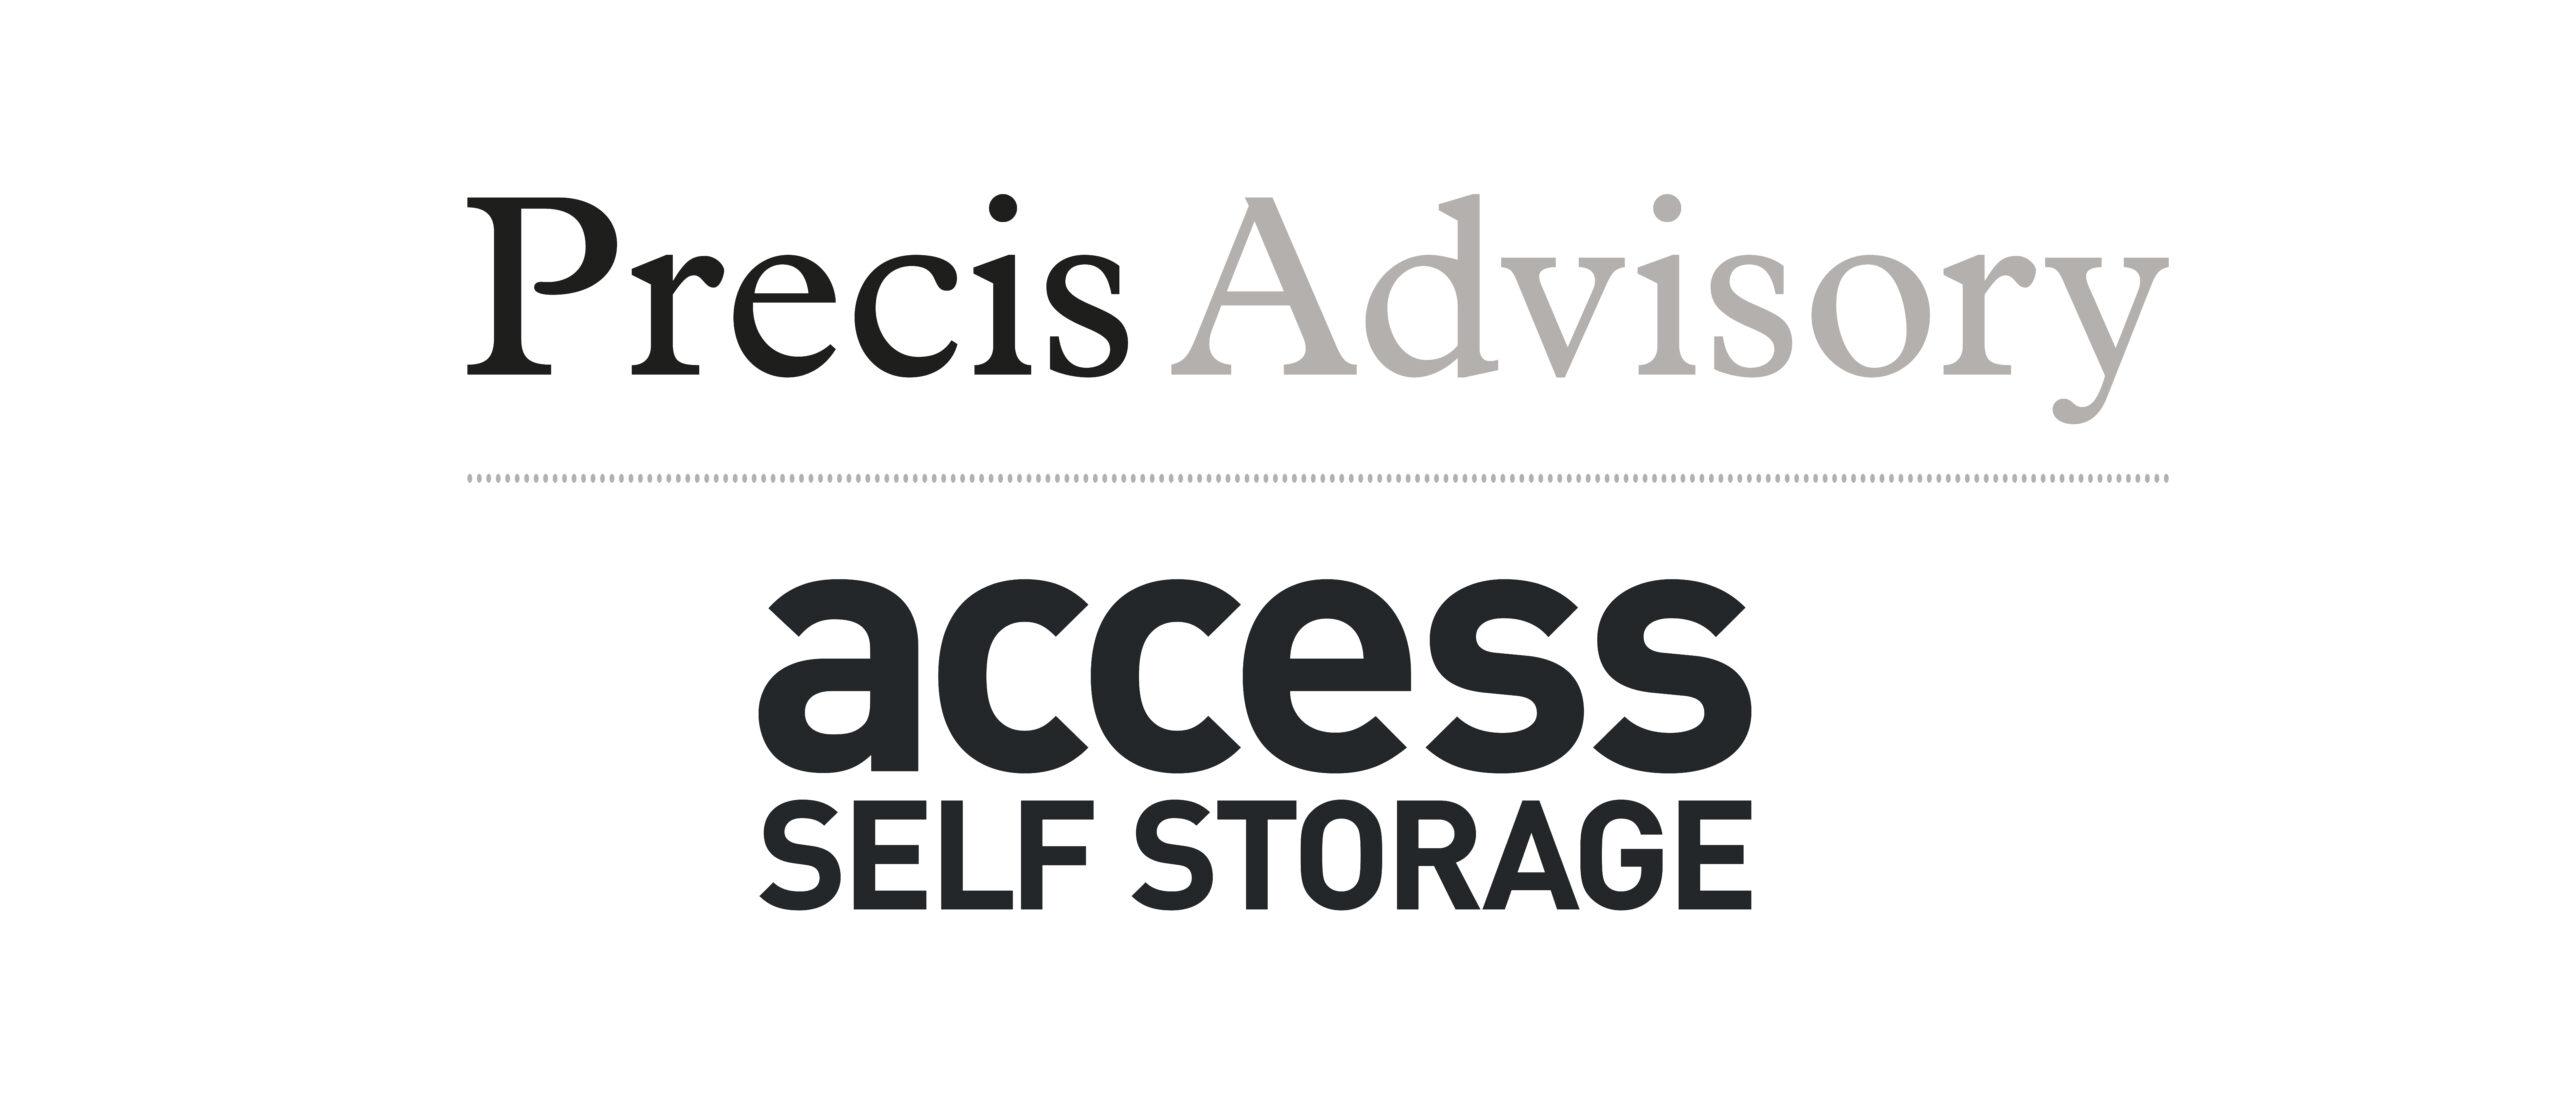 Precis Advisory / Access Storage